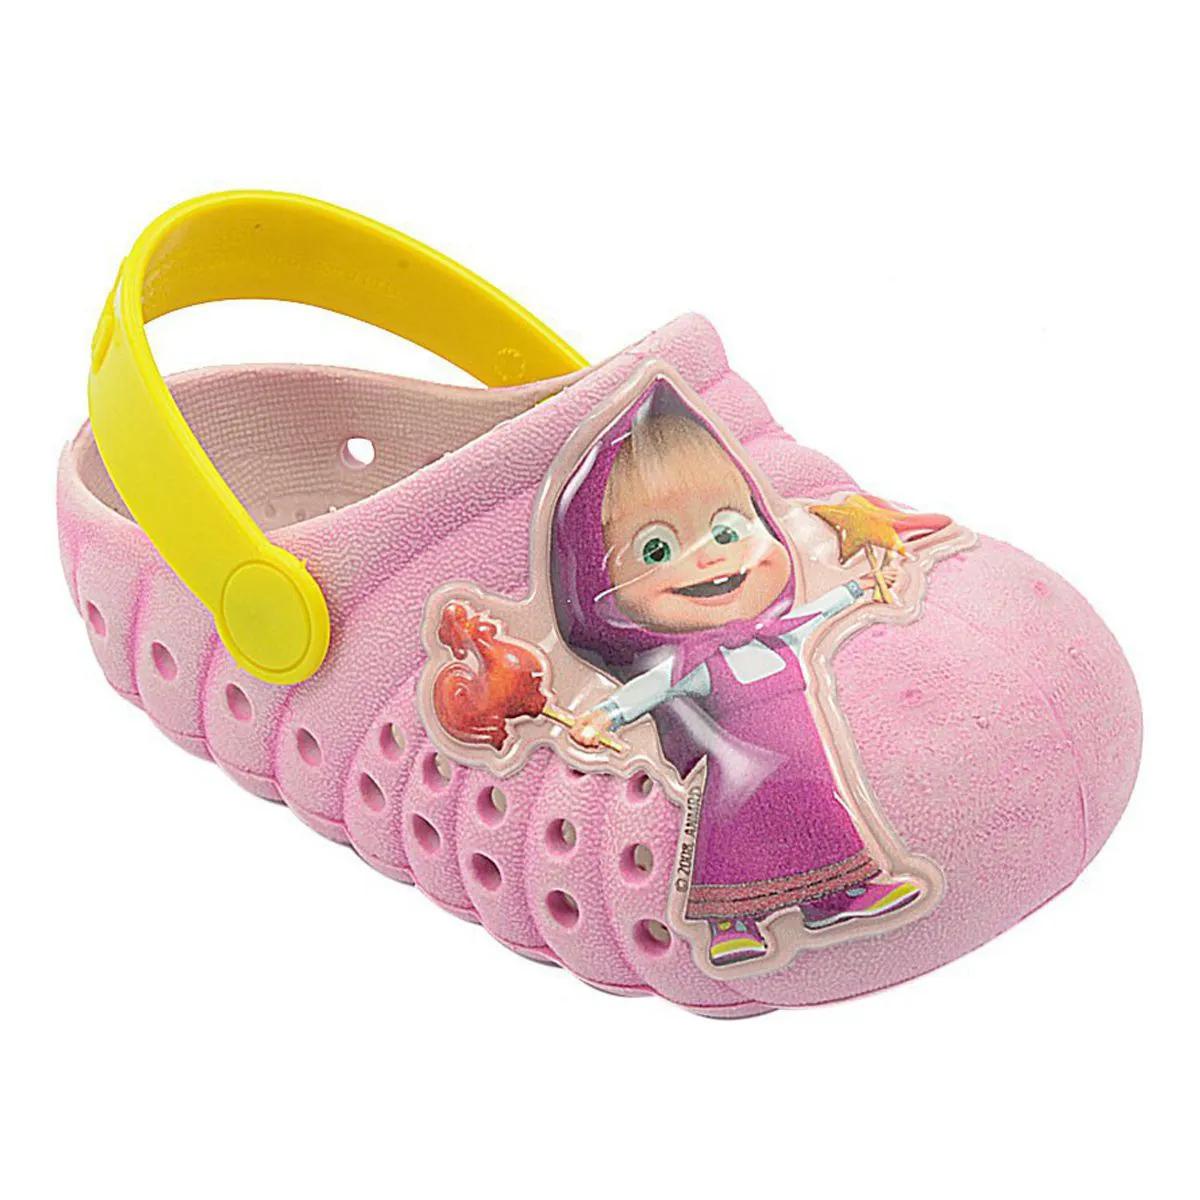 Babuche Infantil Masha e o Urso Pink e Amarelo Feminino